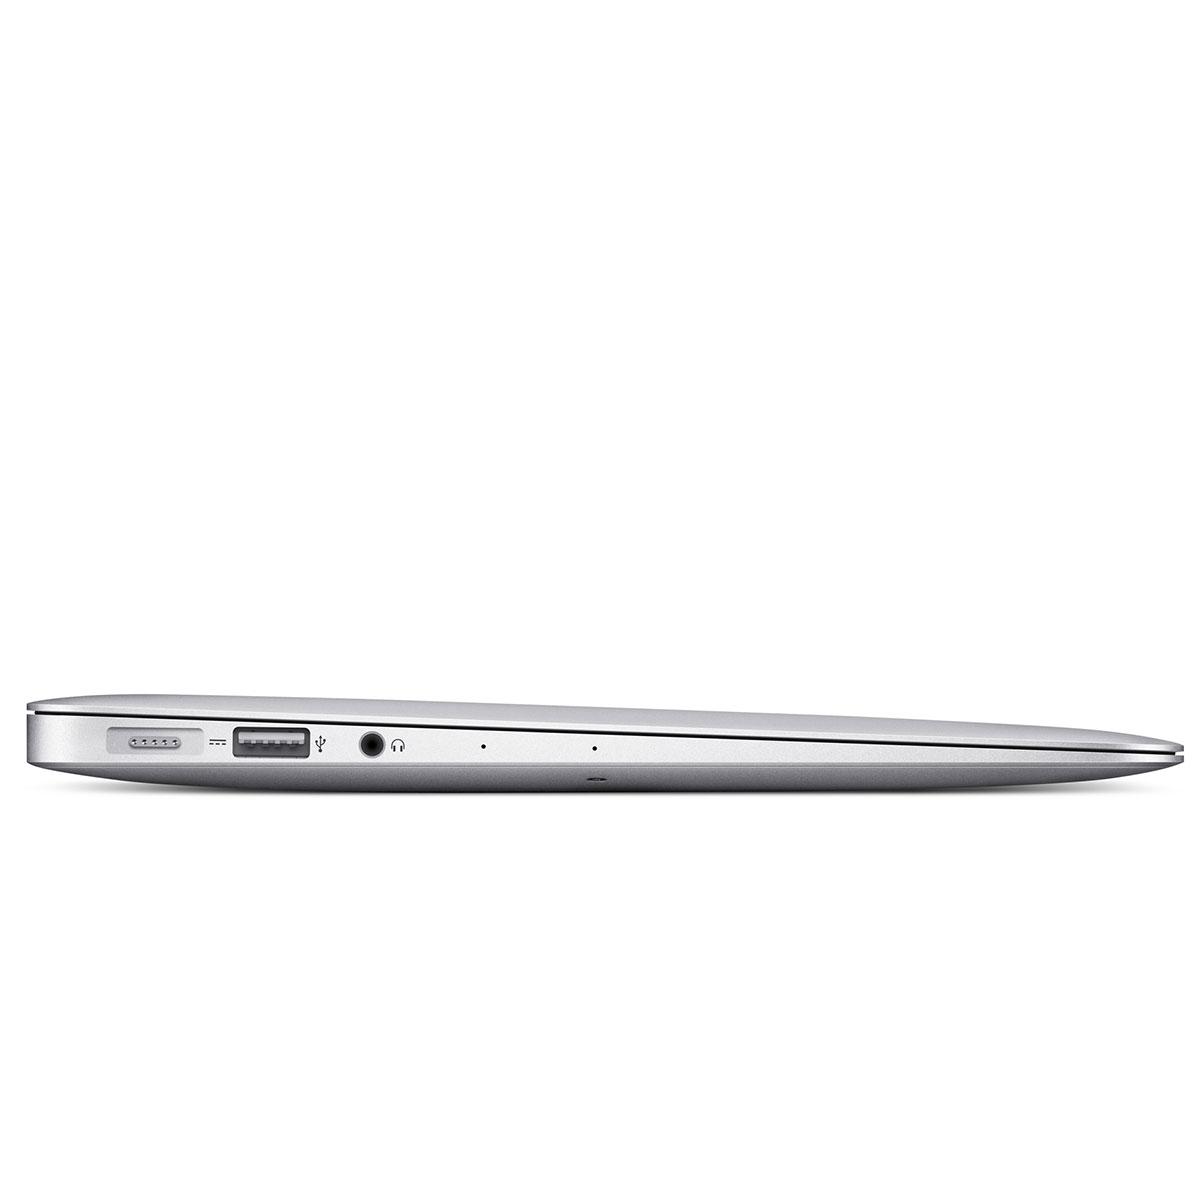 apple macbook air 13 mjvg2f a mjvg2f a achat. Black Bedroom Furniture Sets. Home Design Ideas